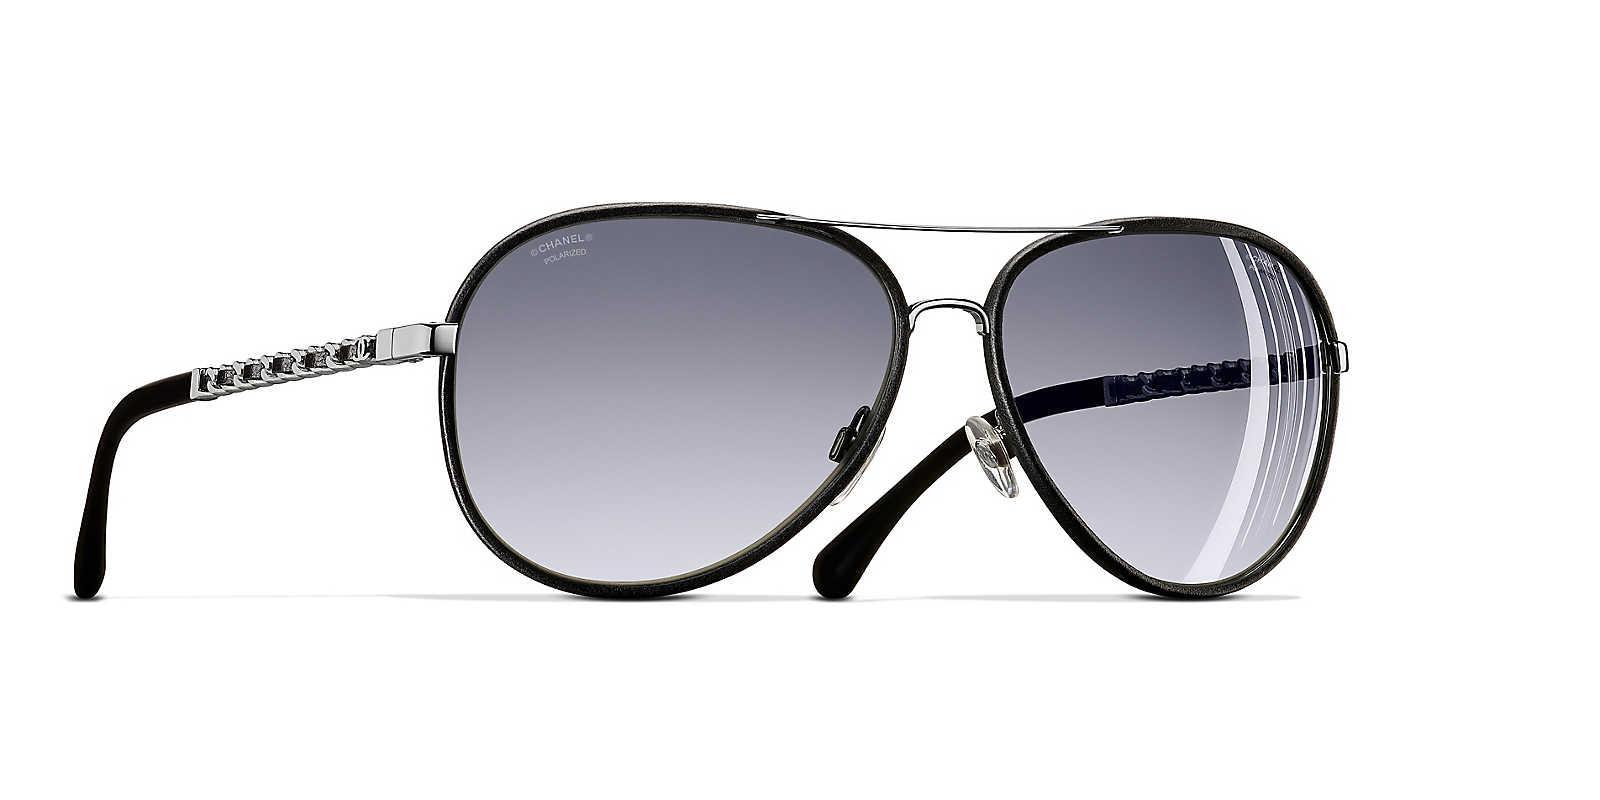 004a067caa8c Chanel Sunglass Pilot Sunglasses in Gray - Lyst